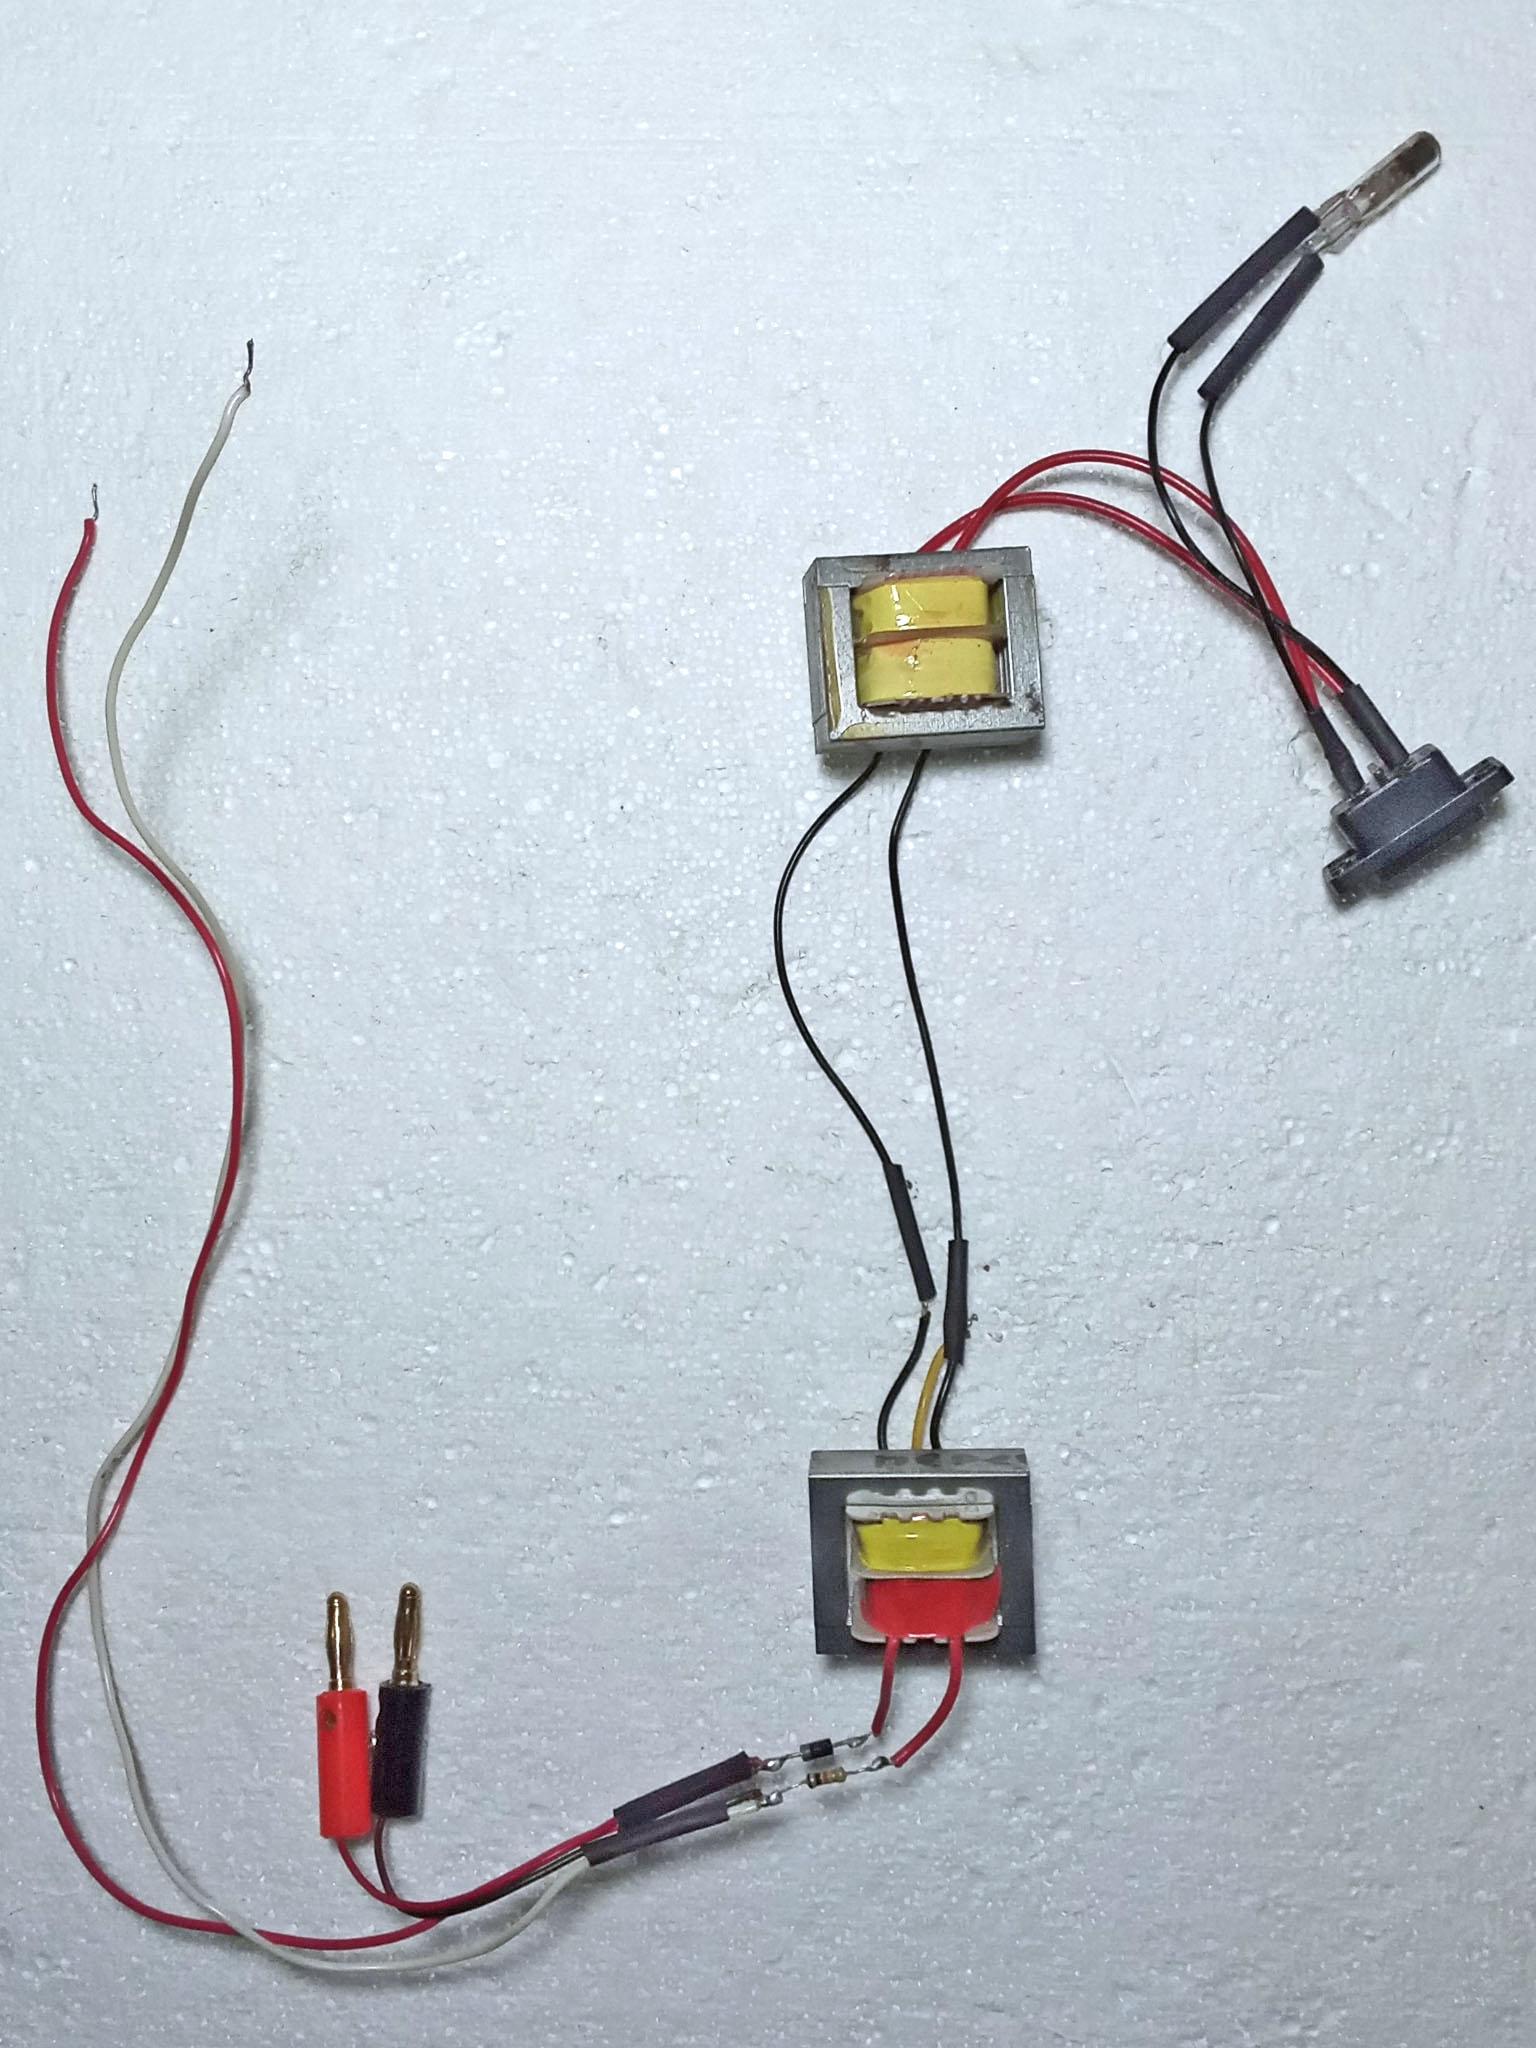 устройство для проверки светодиодов